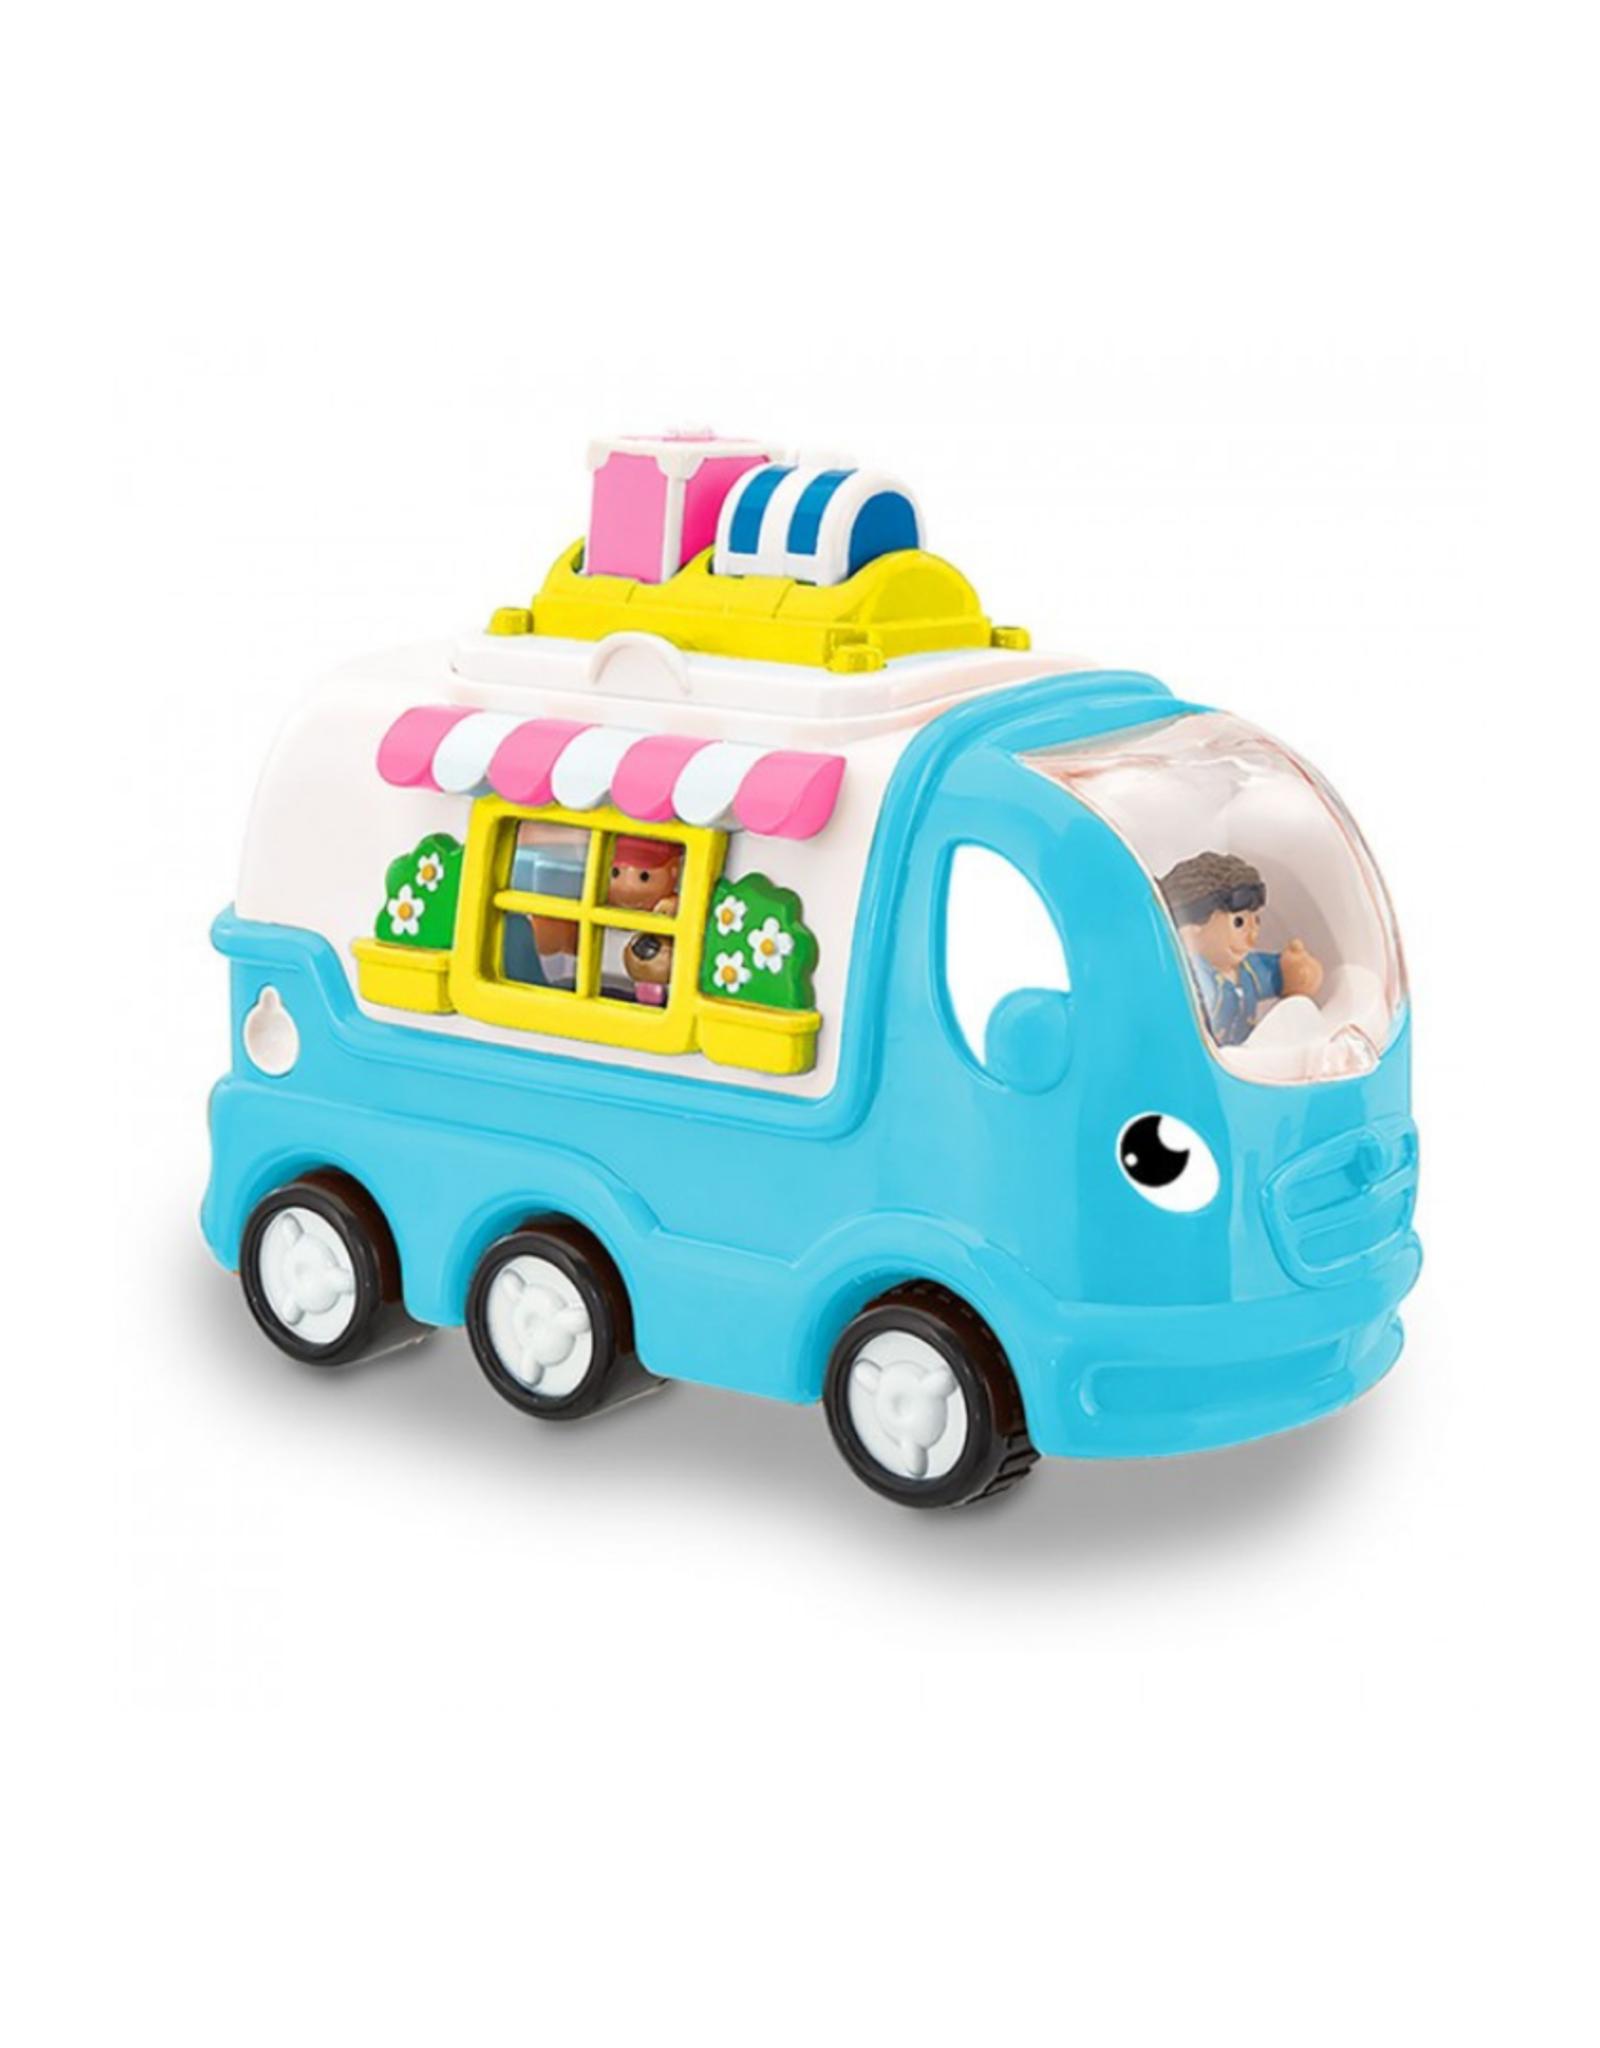 WOW Toys WOW Toys - Kitty Camper Van